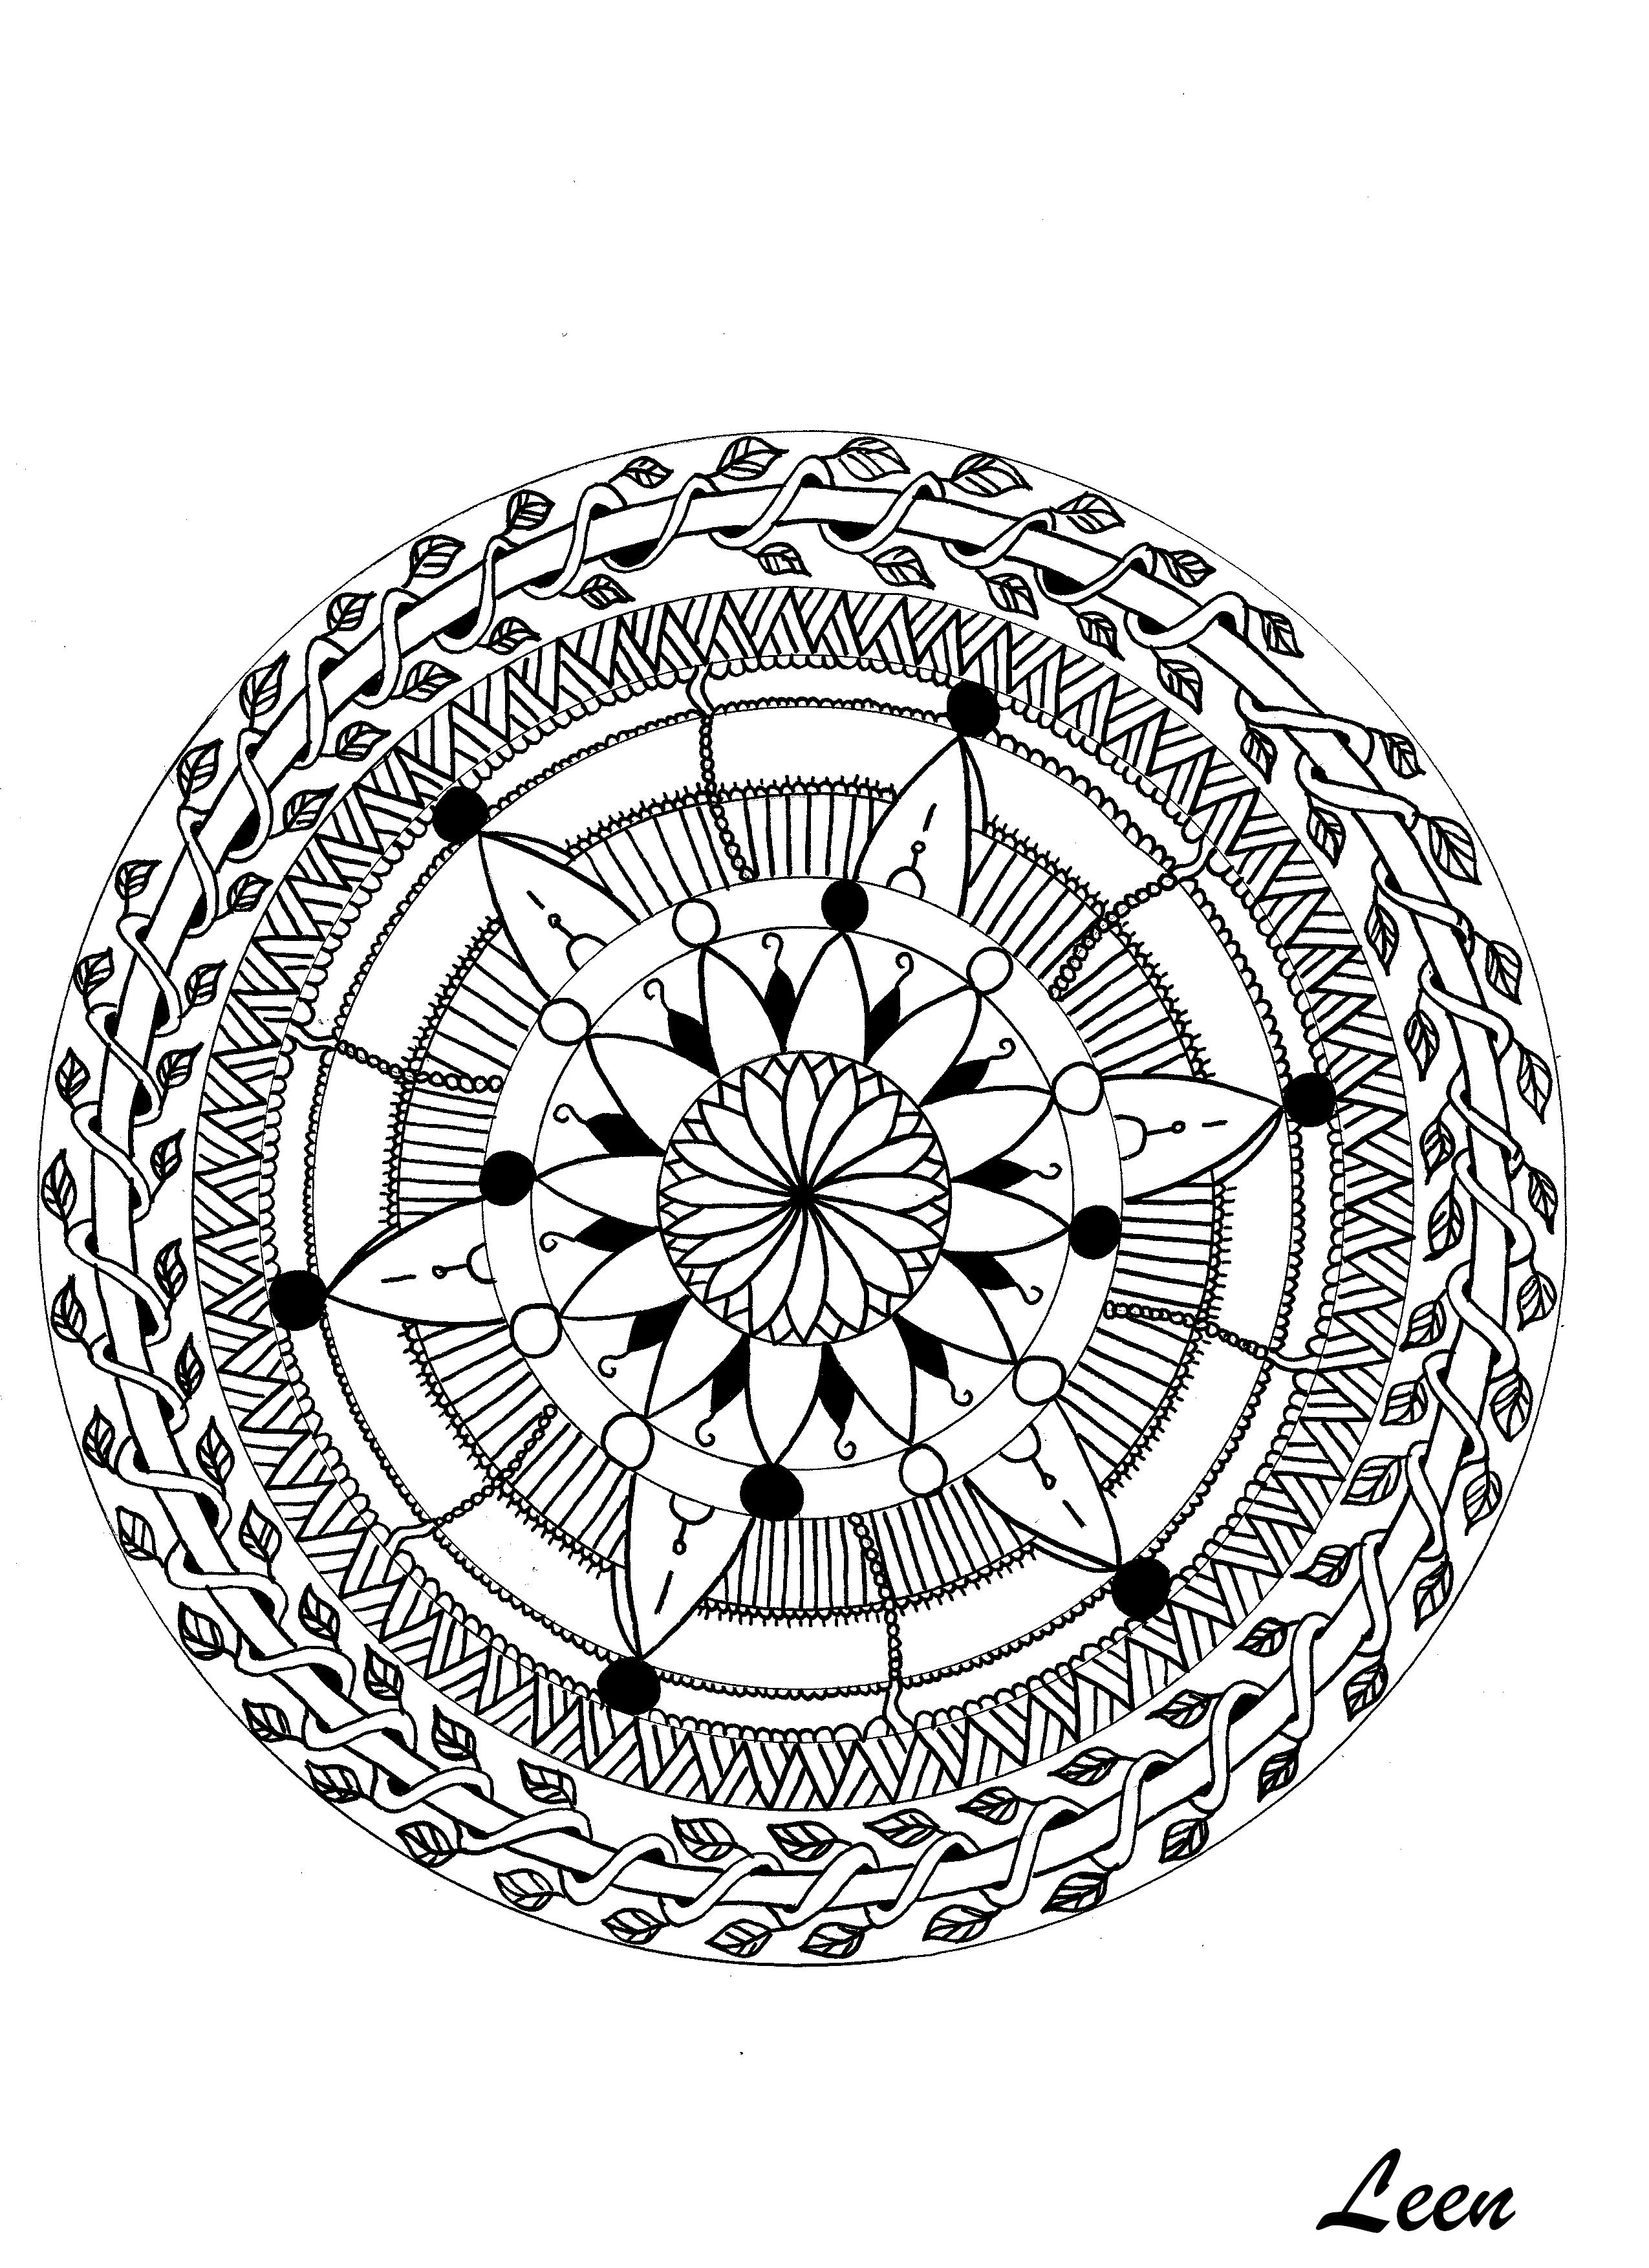 Leen margot mandala feuillu mandalas coloriages - Mandala pour adultes ...